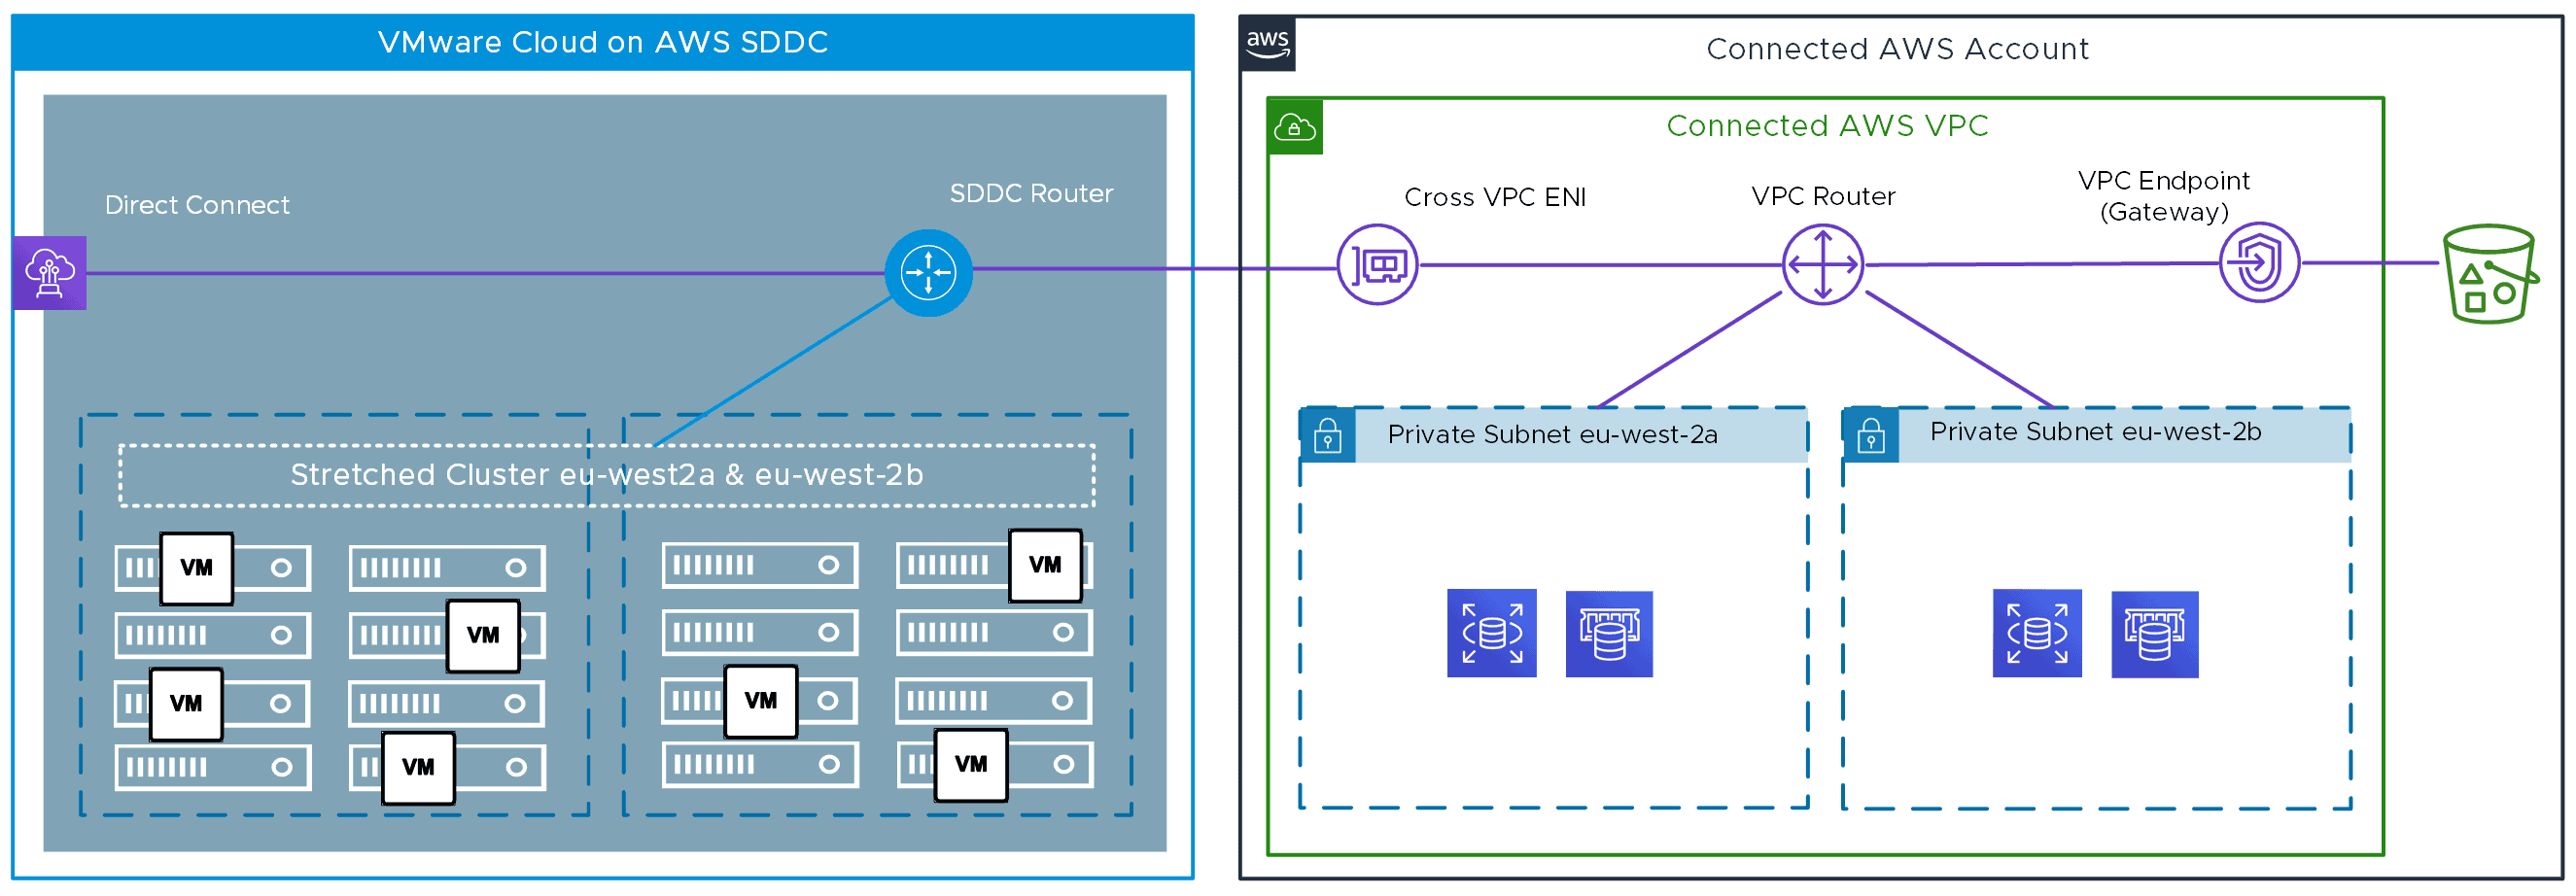 VMware hybrid cloud architecture